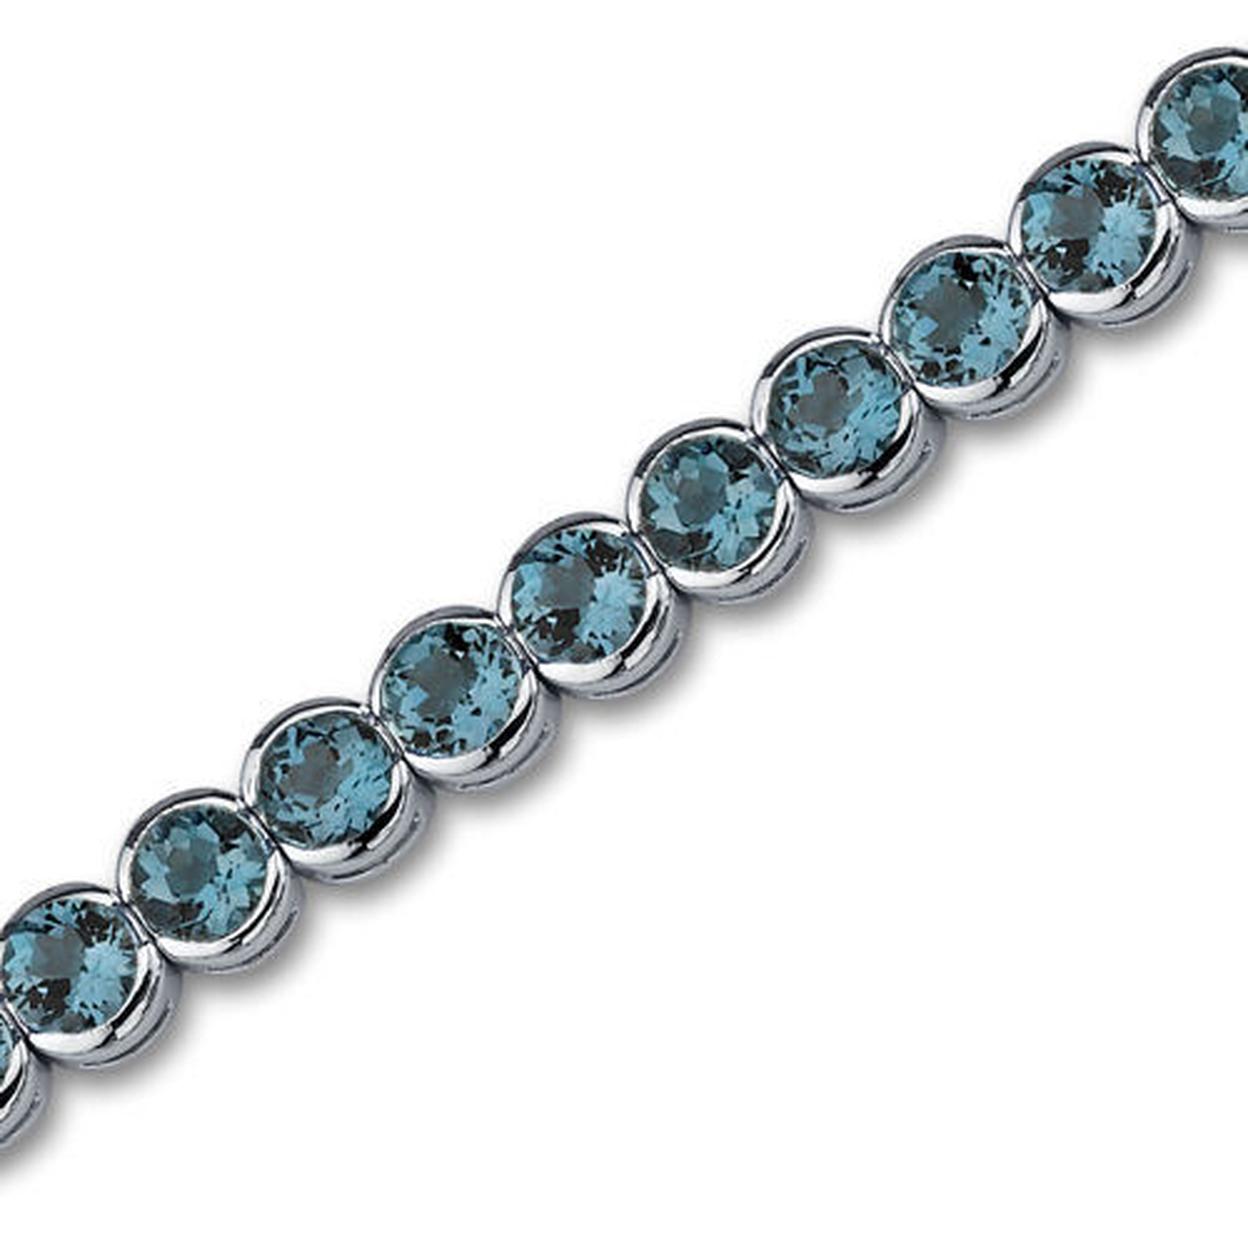 Firey 19.00 Carats Round Cut London Blue Topaz Tennis Bracelet In Sterling Silver Style Sb2754